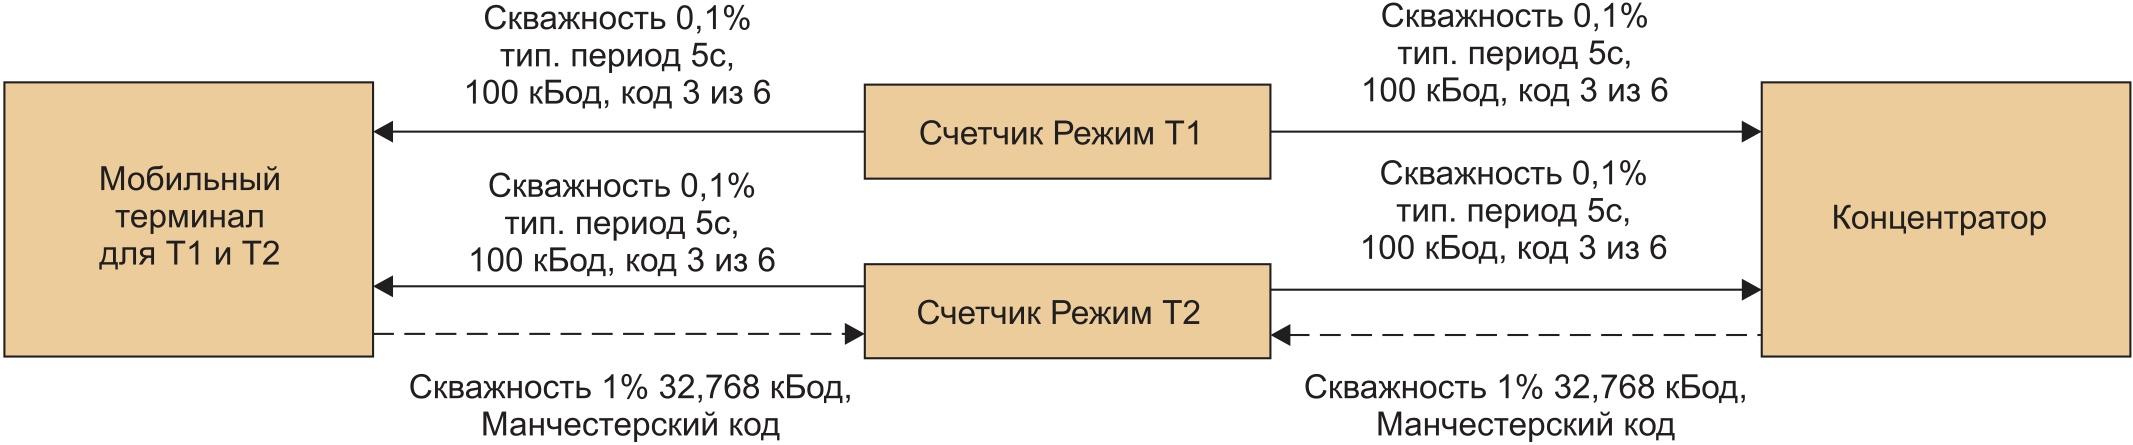 Режим T стандарта EN 13757-4:2010